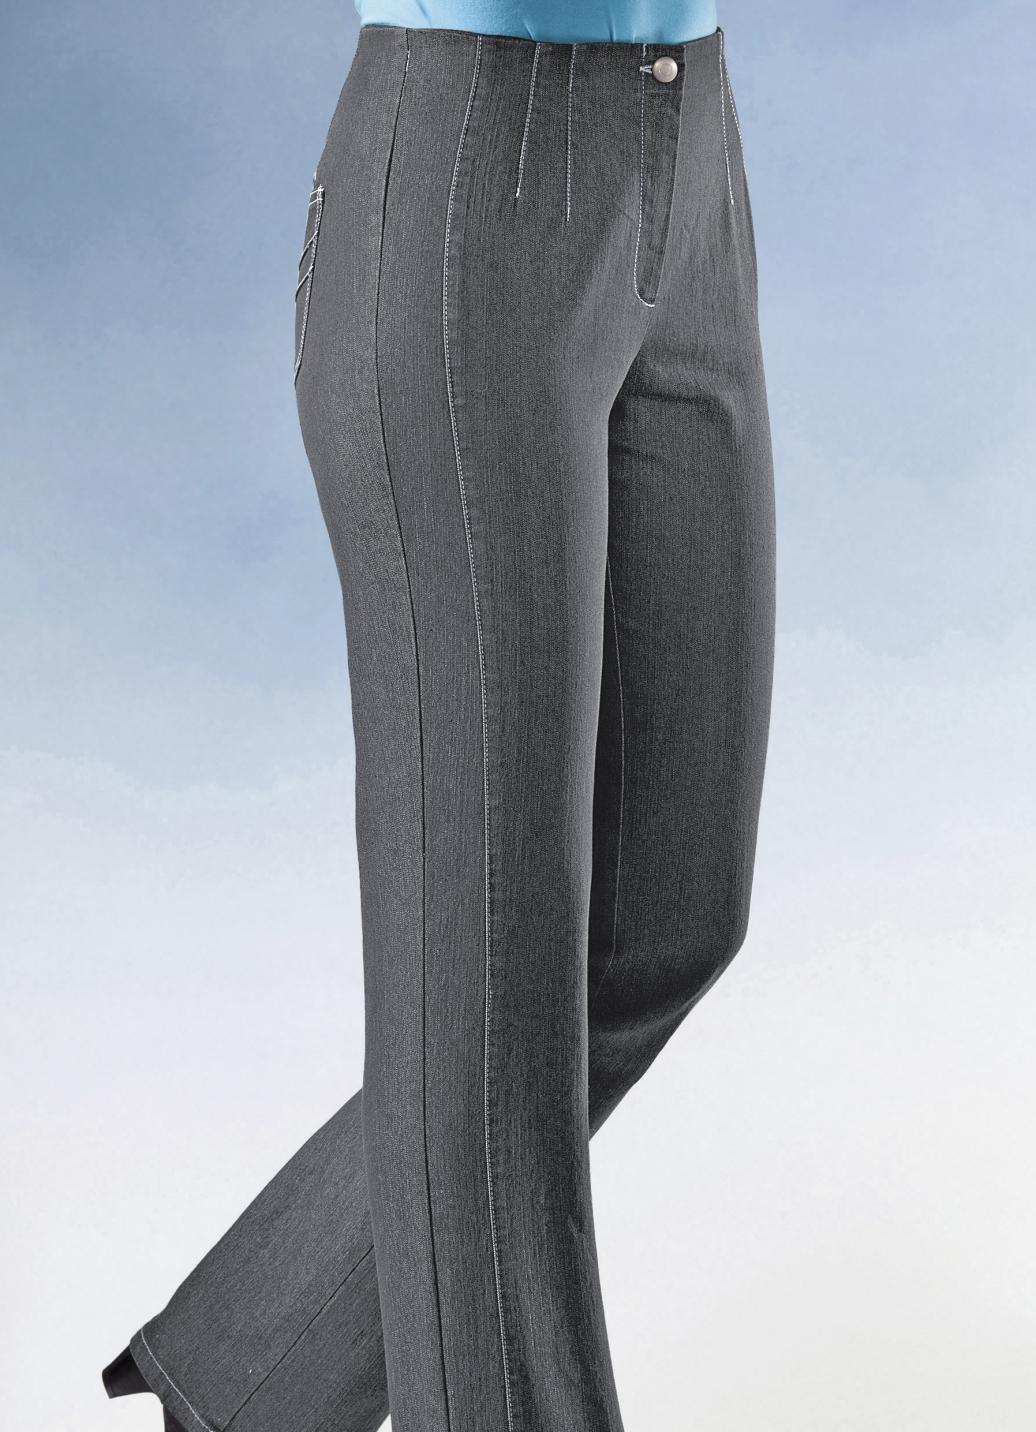 jeans mit angeschnittenem bund in 5 farben hosen bader. Black Bedroom Furniture Sets. Home Design Ideas